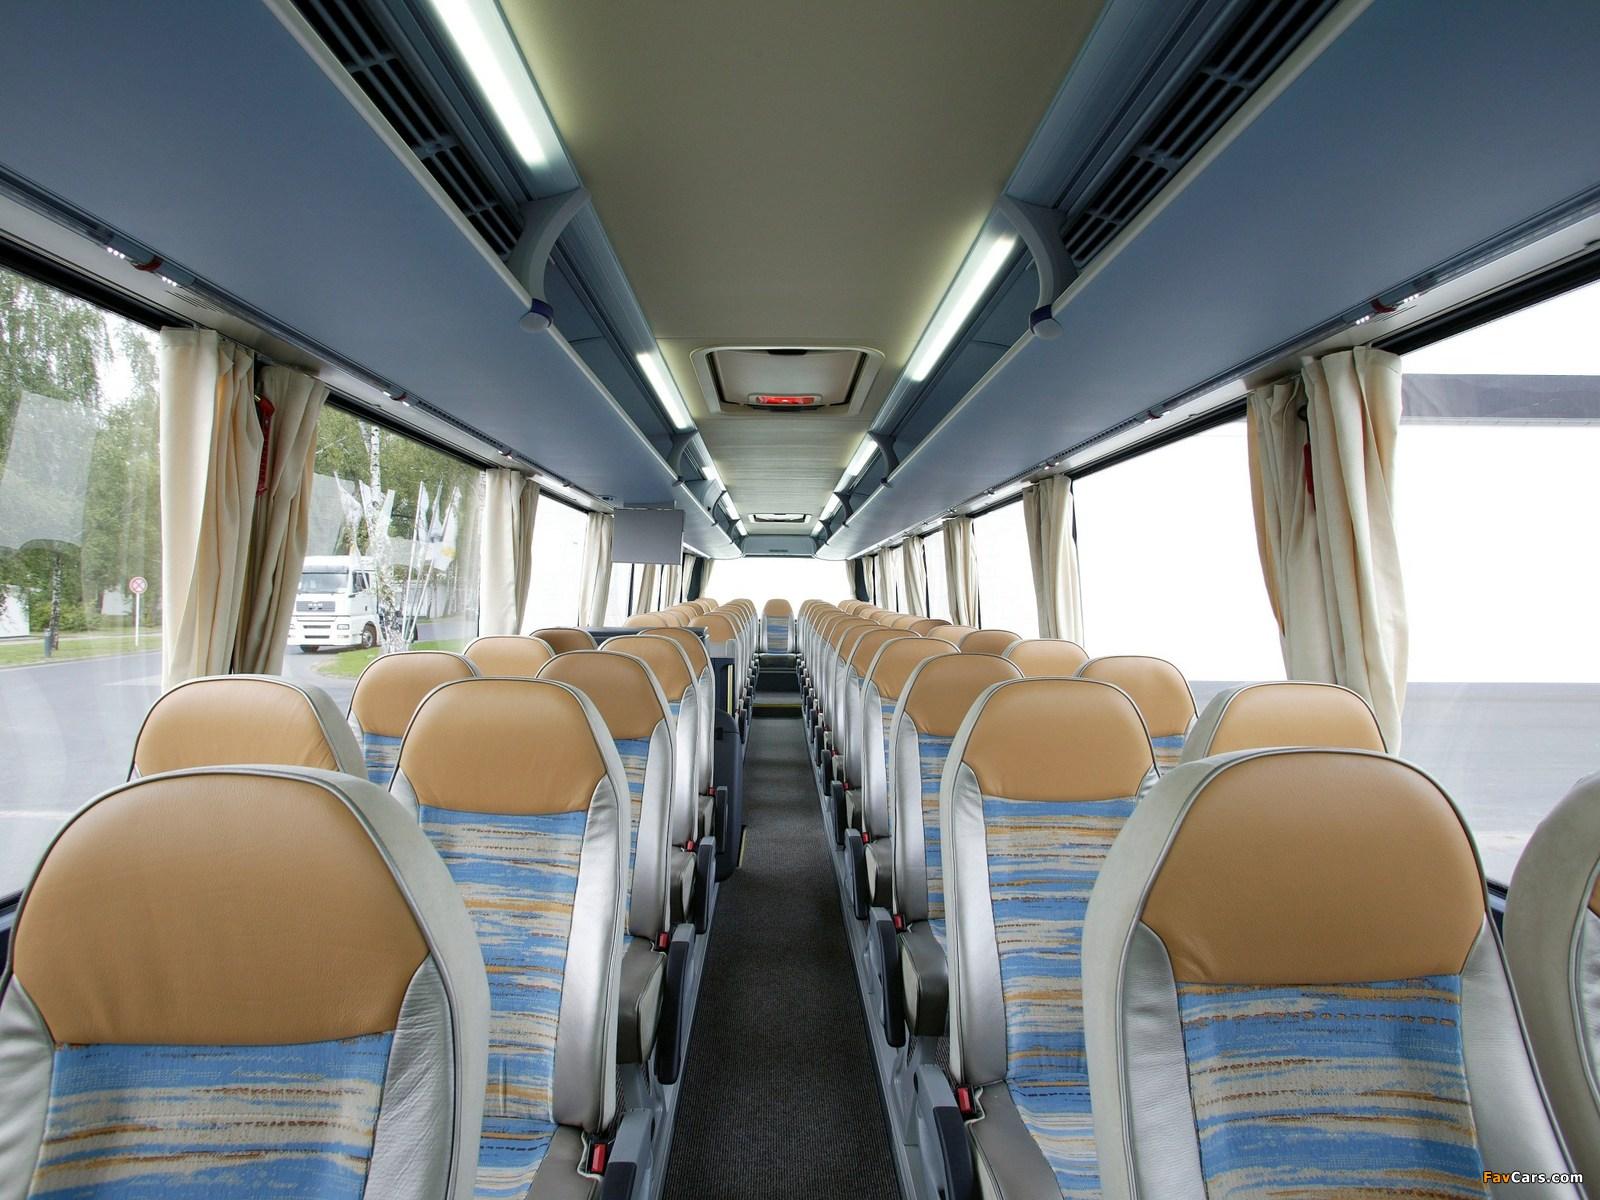 Neoplan Tourliner L 2006 photos (1600 x 1200)